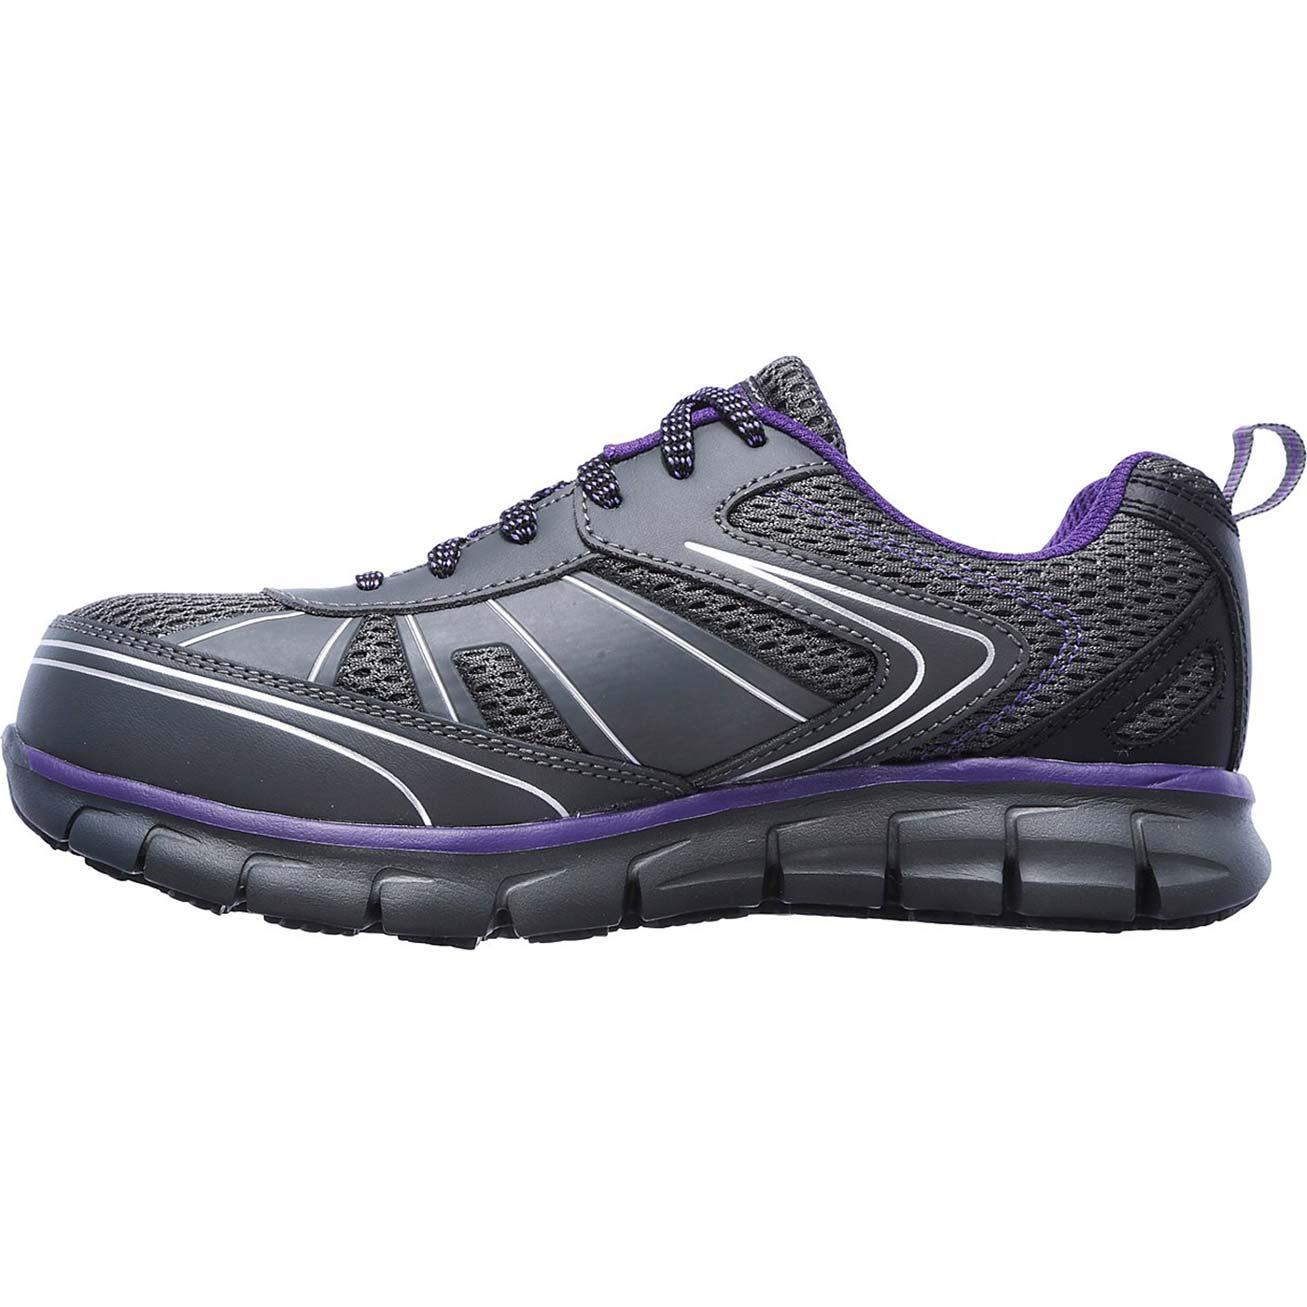 2f69b3837bb6 SKECHERS Work Synergy Algonac Alloy Toe Work Athletic Shoe